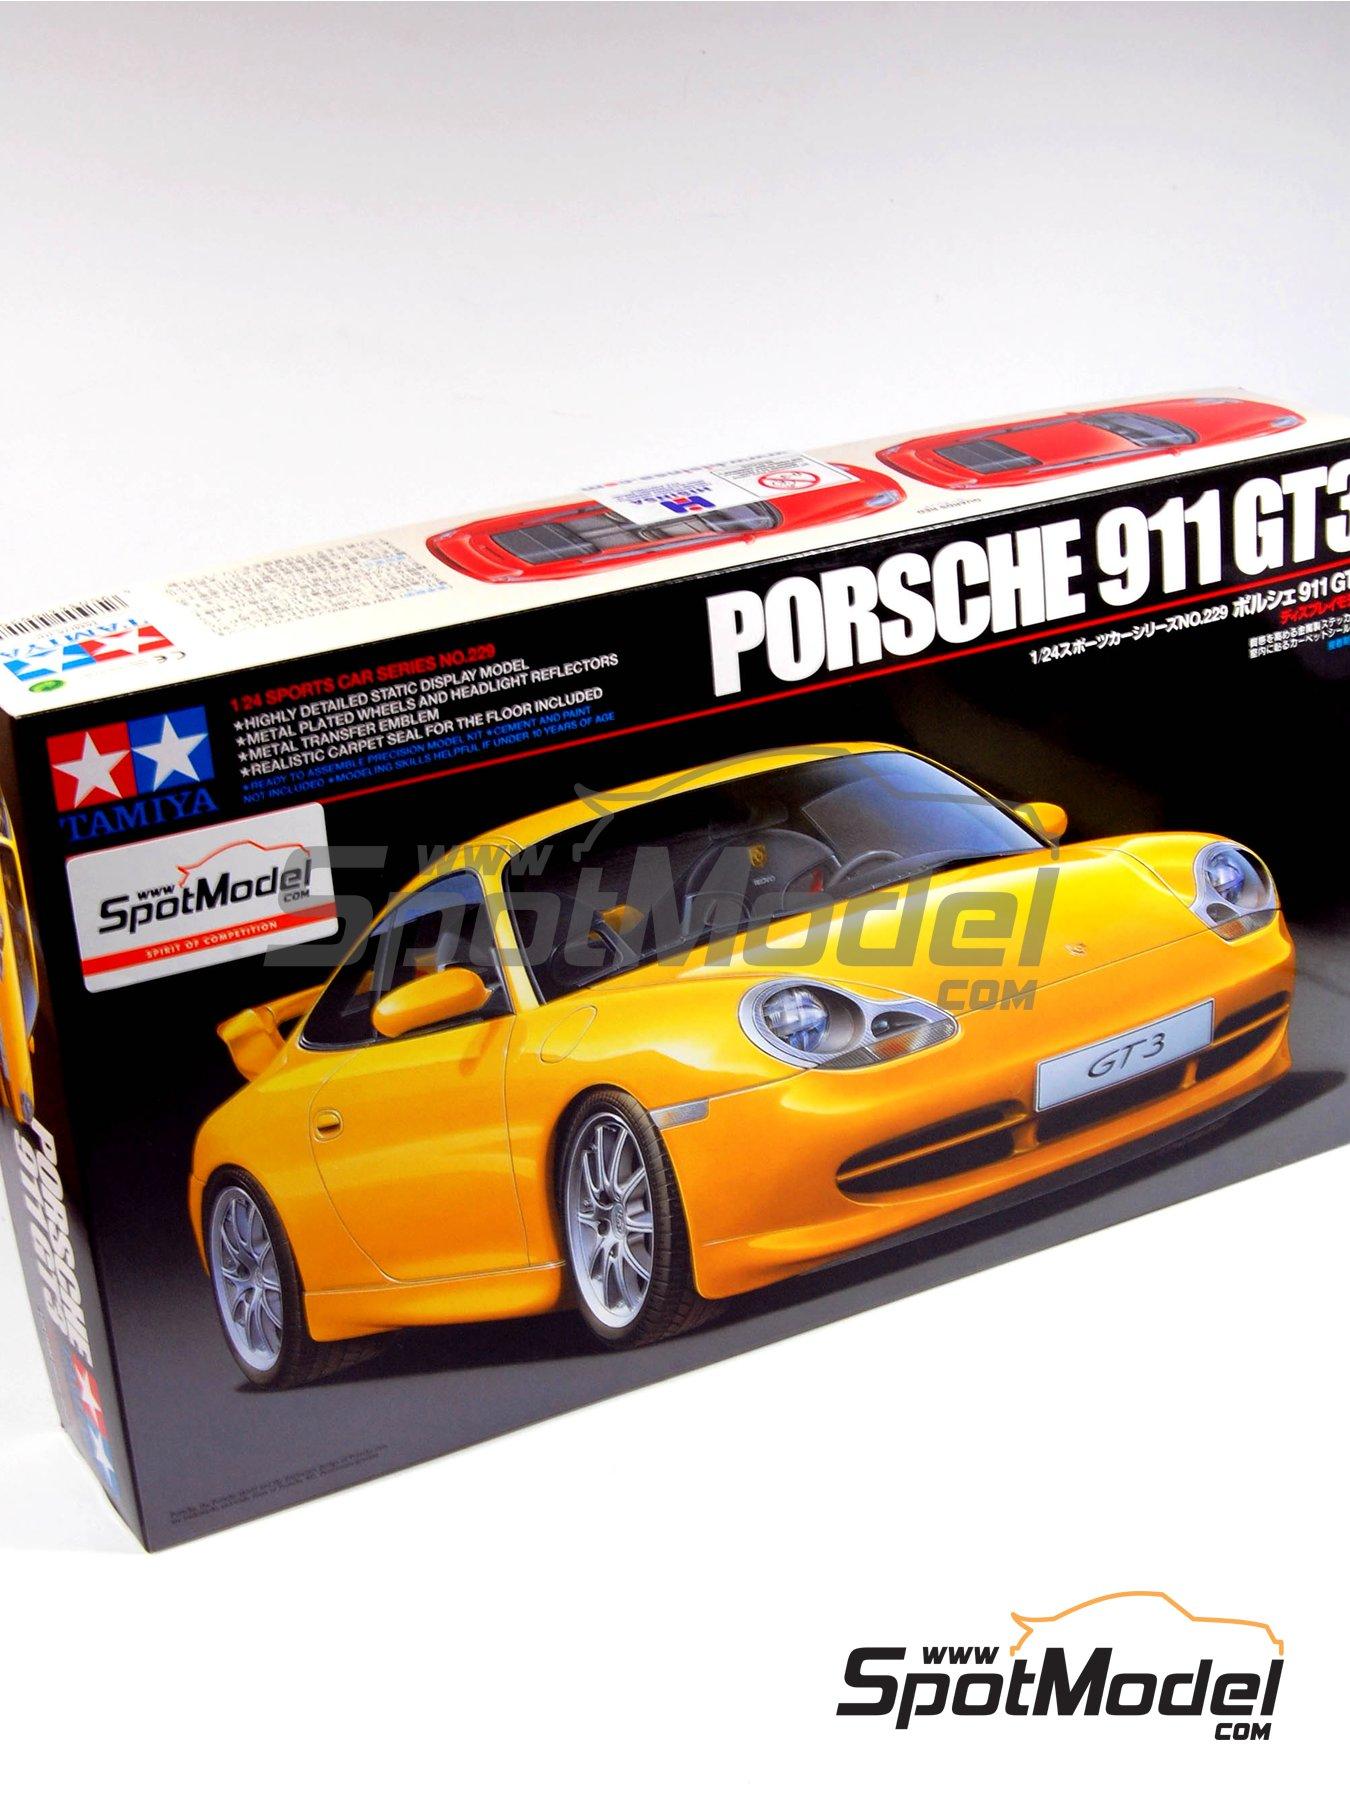 Tamiya: Model car kit 1/24 scale - Porsche 911 996 GT3 (ref ...